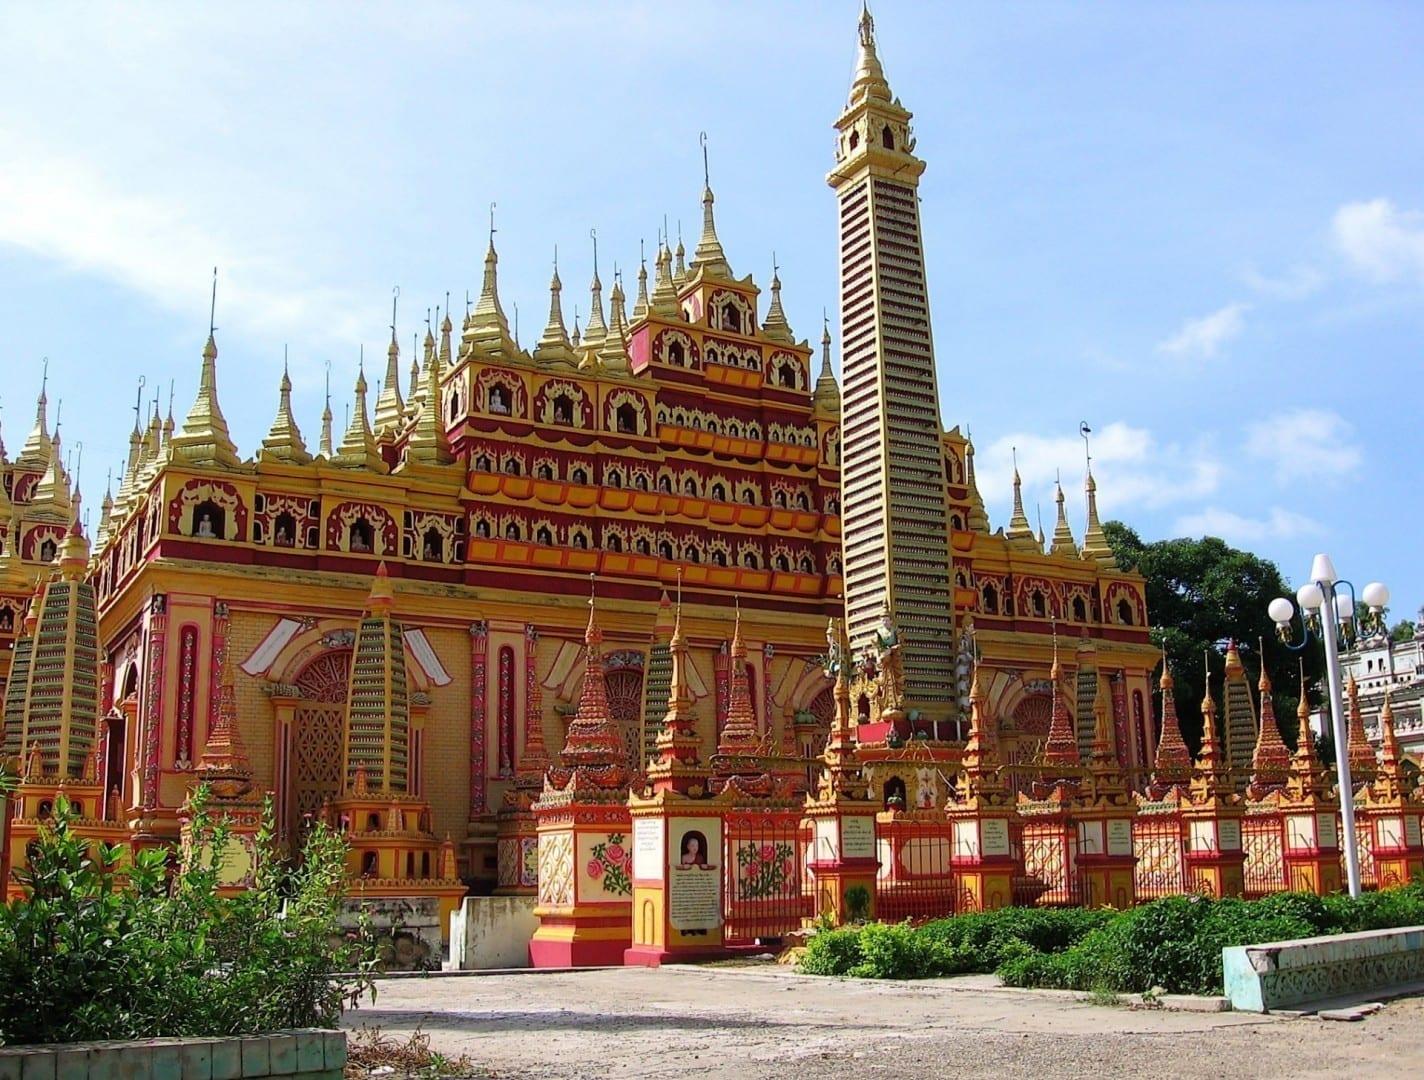 Pagoda de Thanboddhay Monywa Myanmar